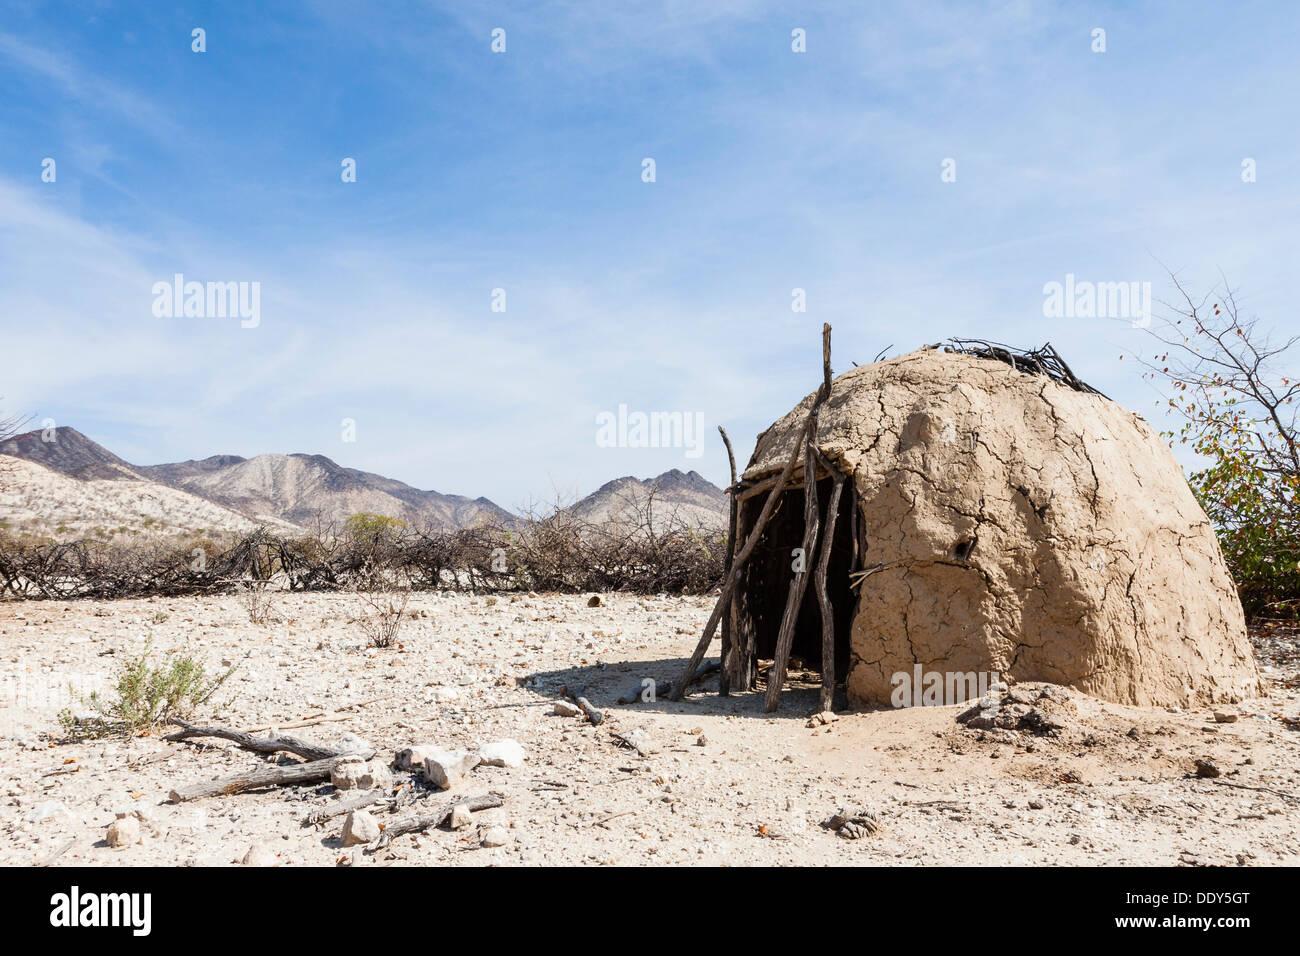 Mud hut of the Himba - Stock Image